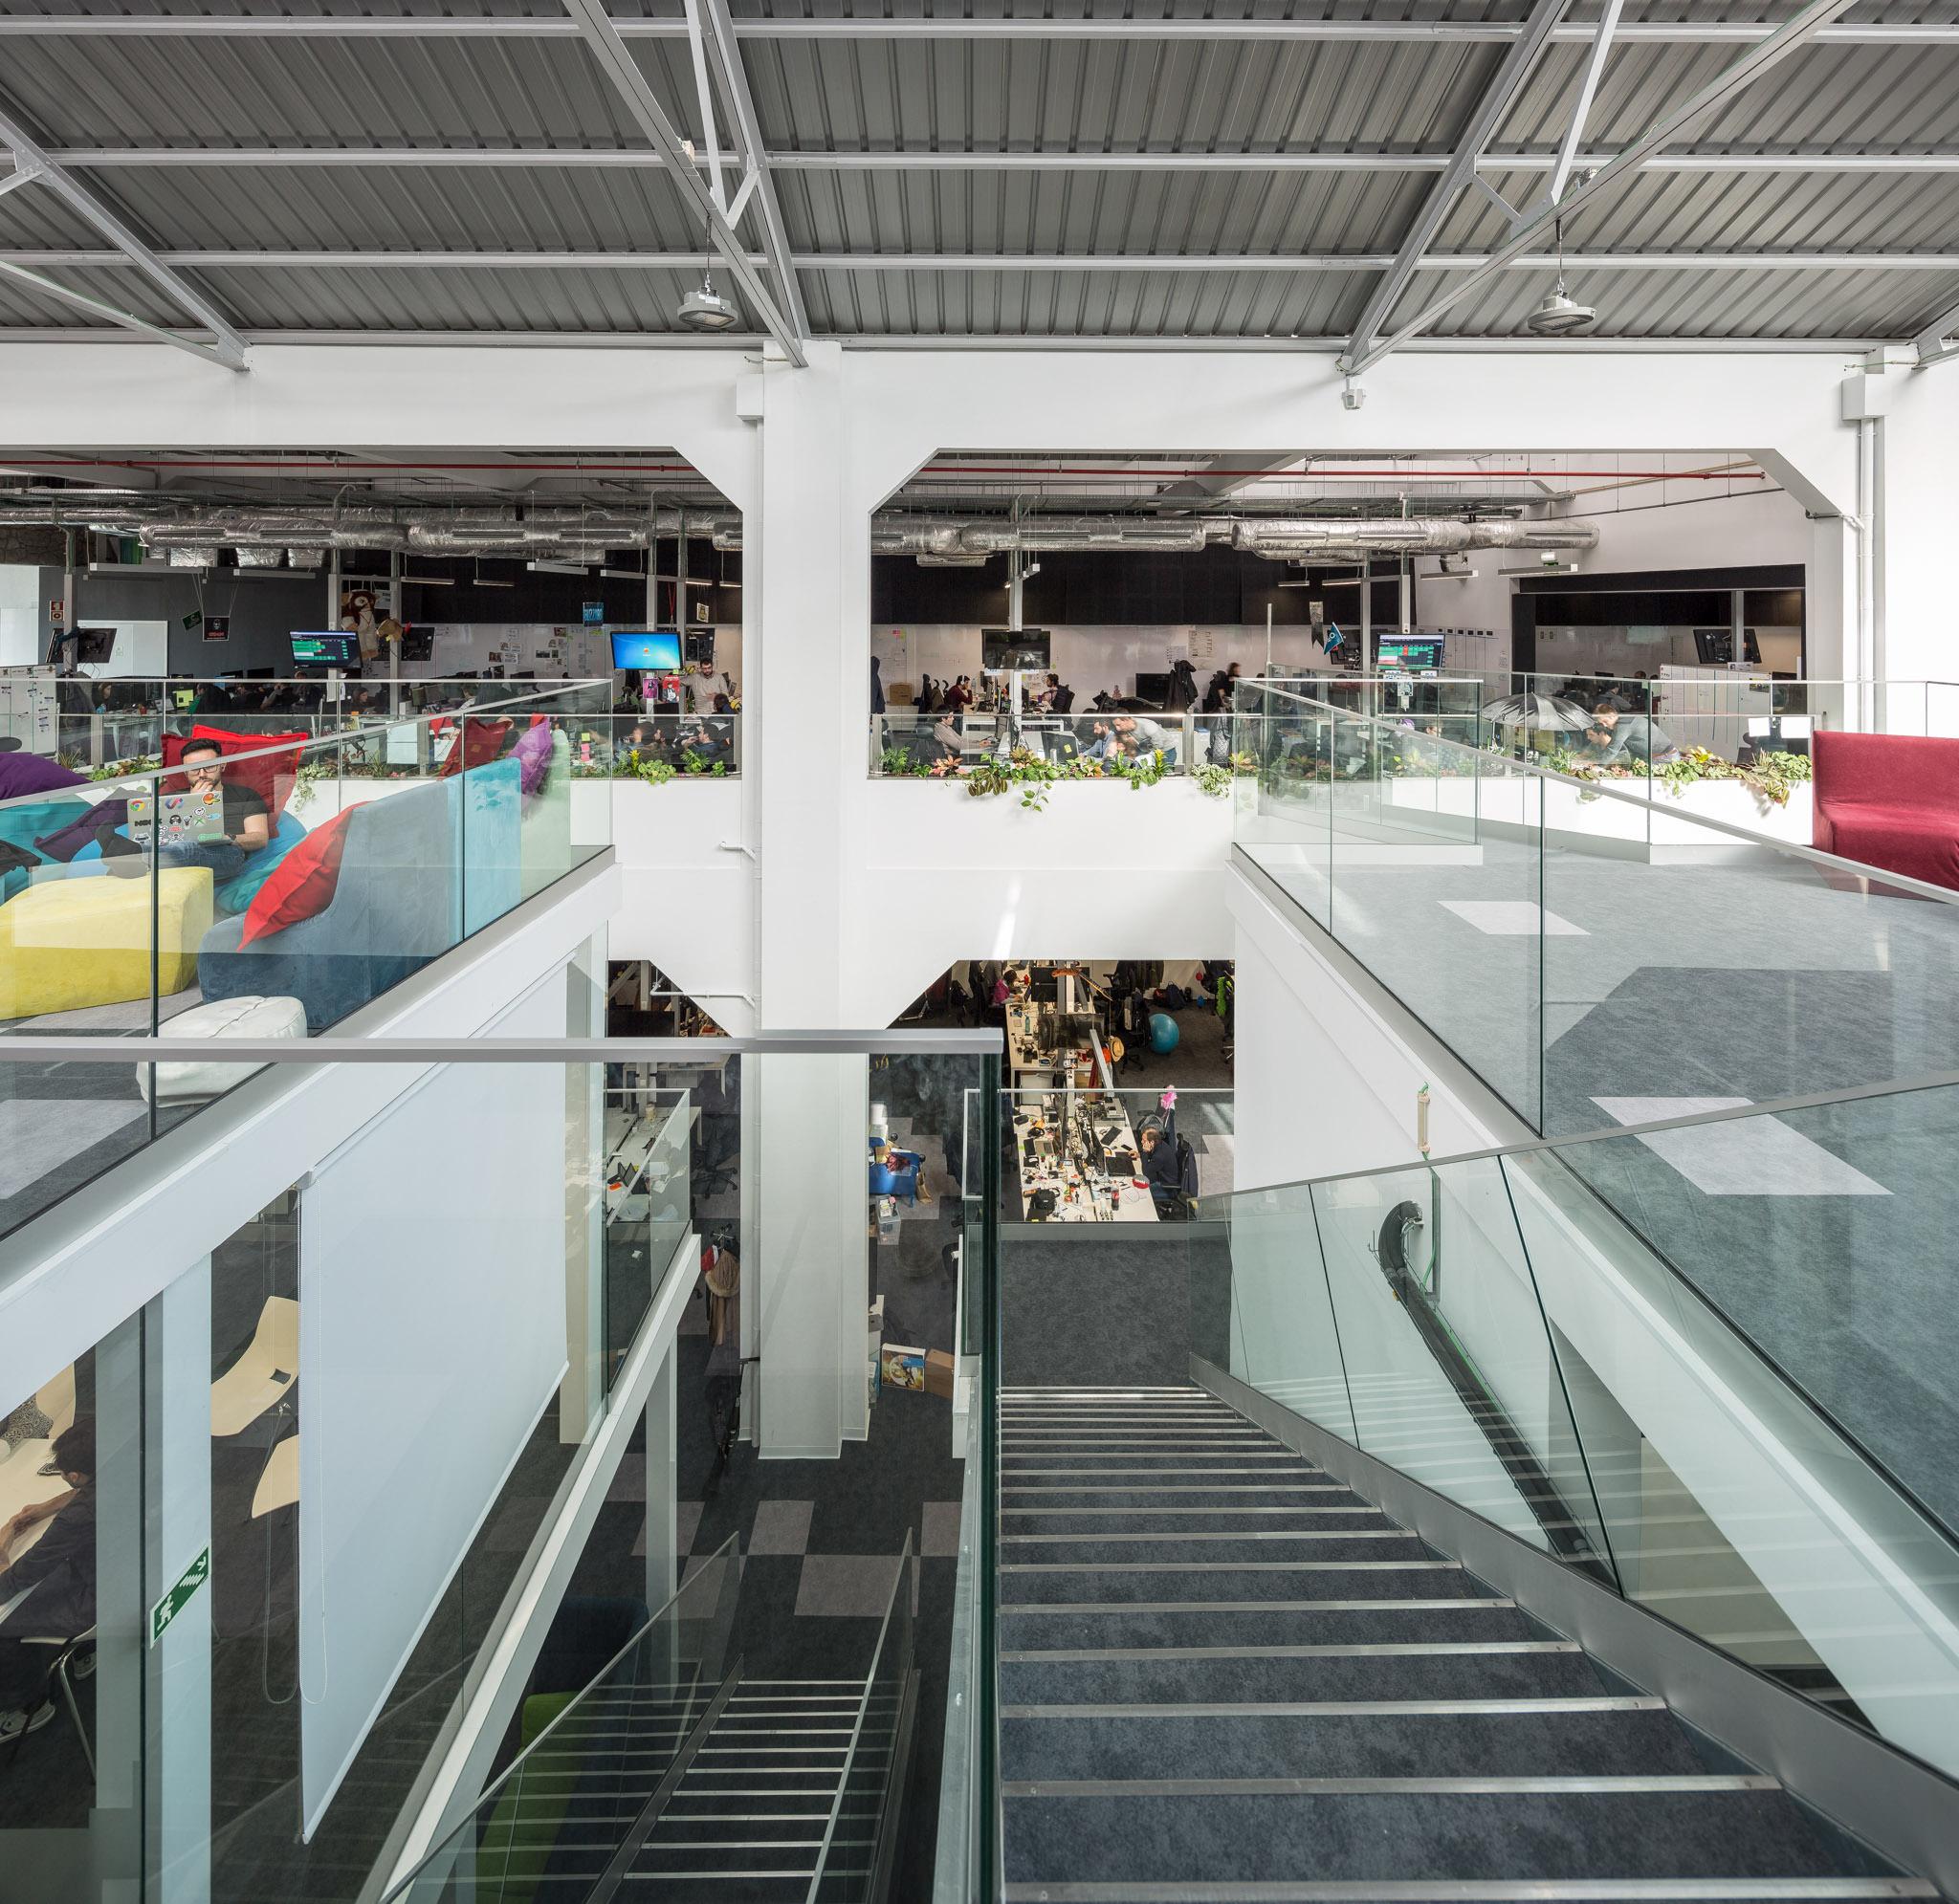 Reportagem Fotografia De Arquitectura Portuguesa Fotografo Ivo Tavares Studio Escritorios Blip De Inception Architects.